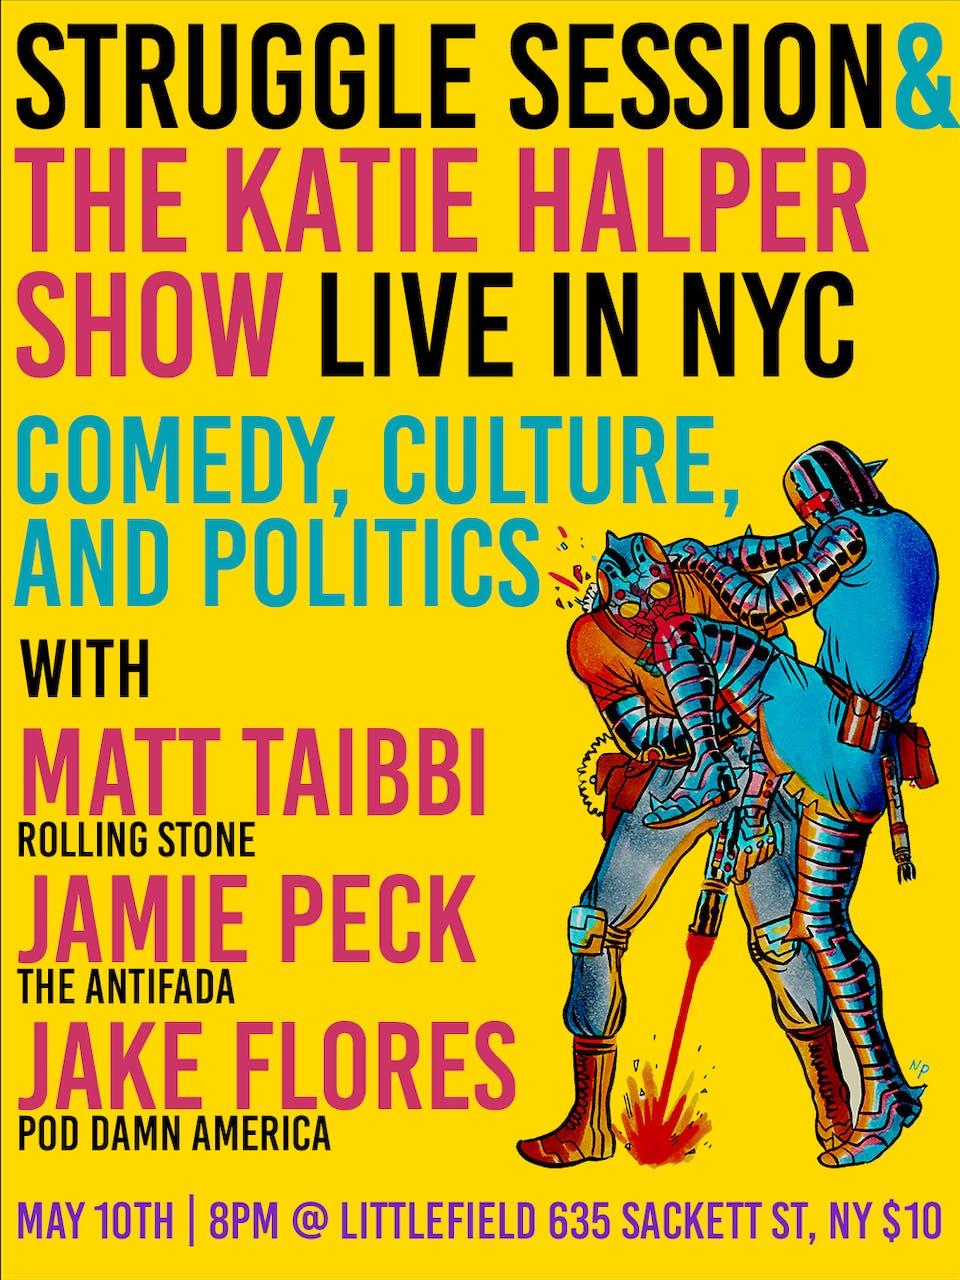 The Katie Halper Show and Struggle Session